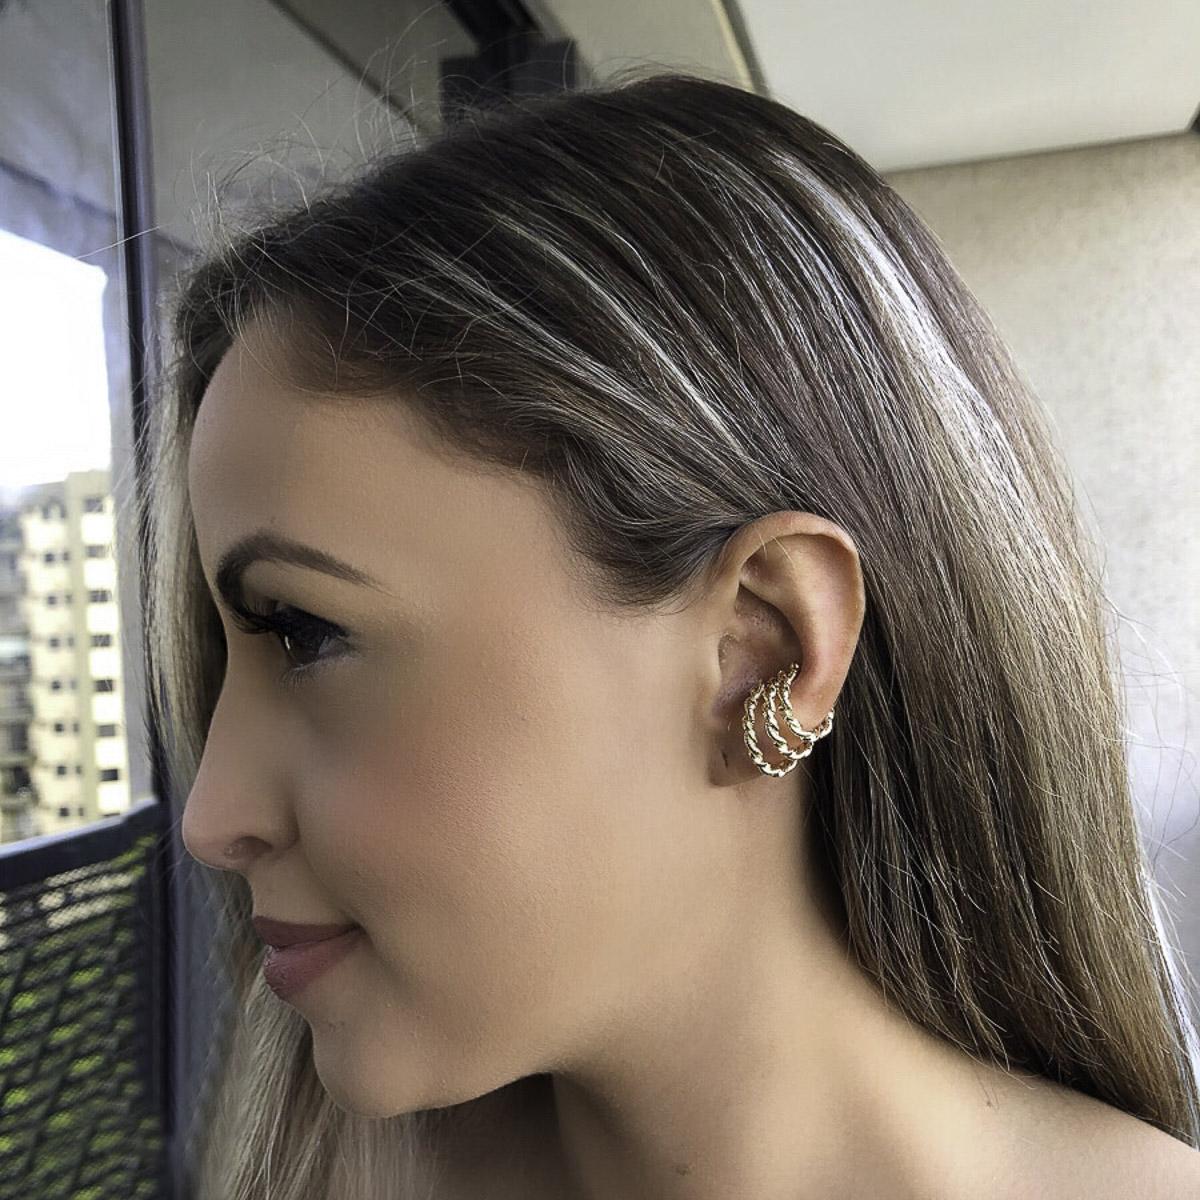 Ear hook semijoia folheado ouro 18k ou ródio design torcido